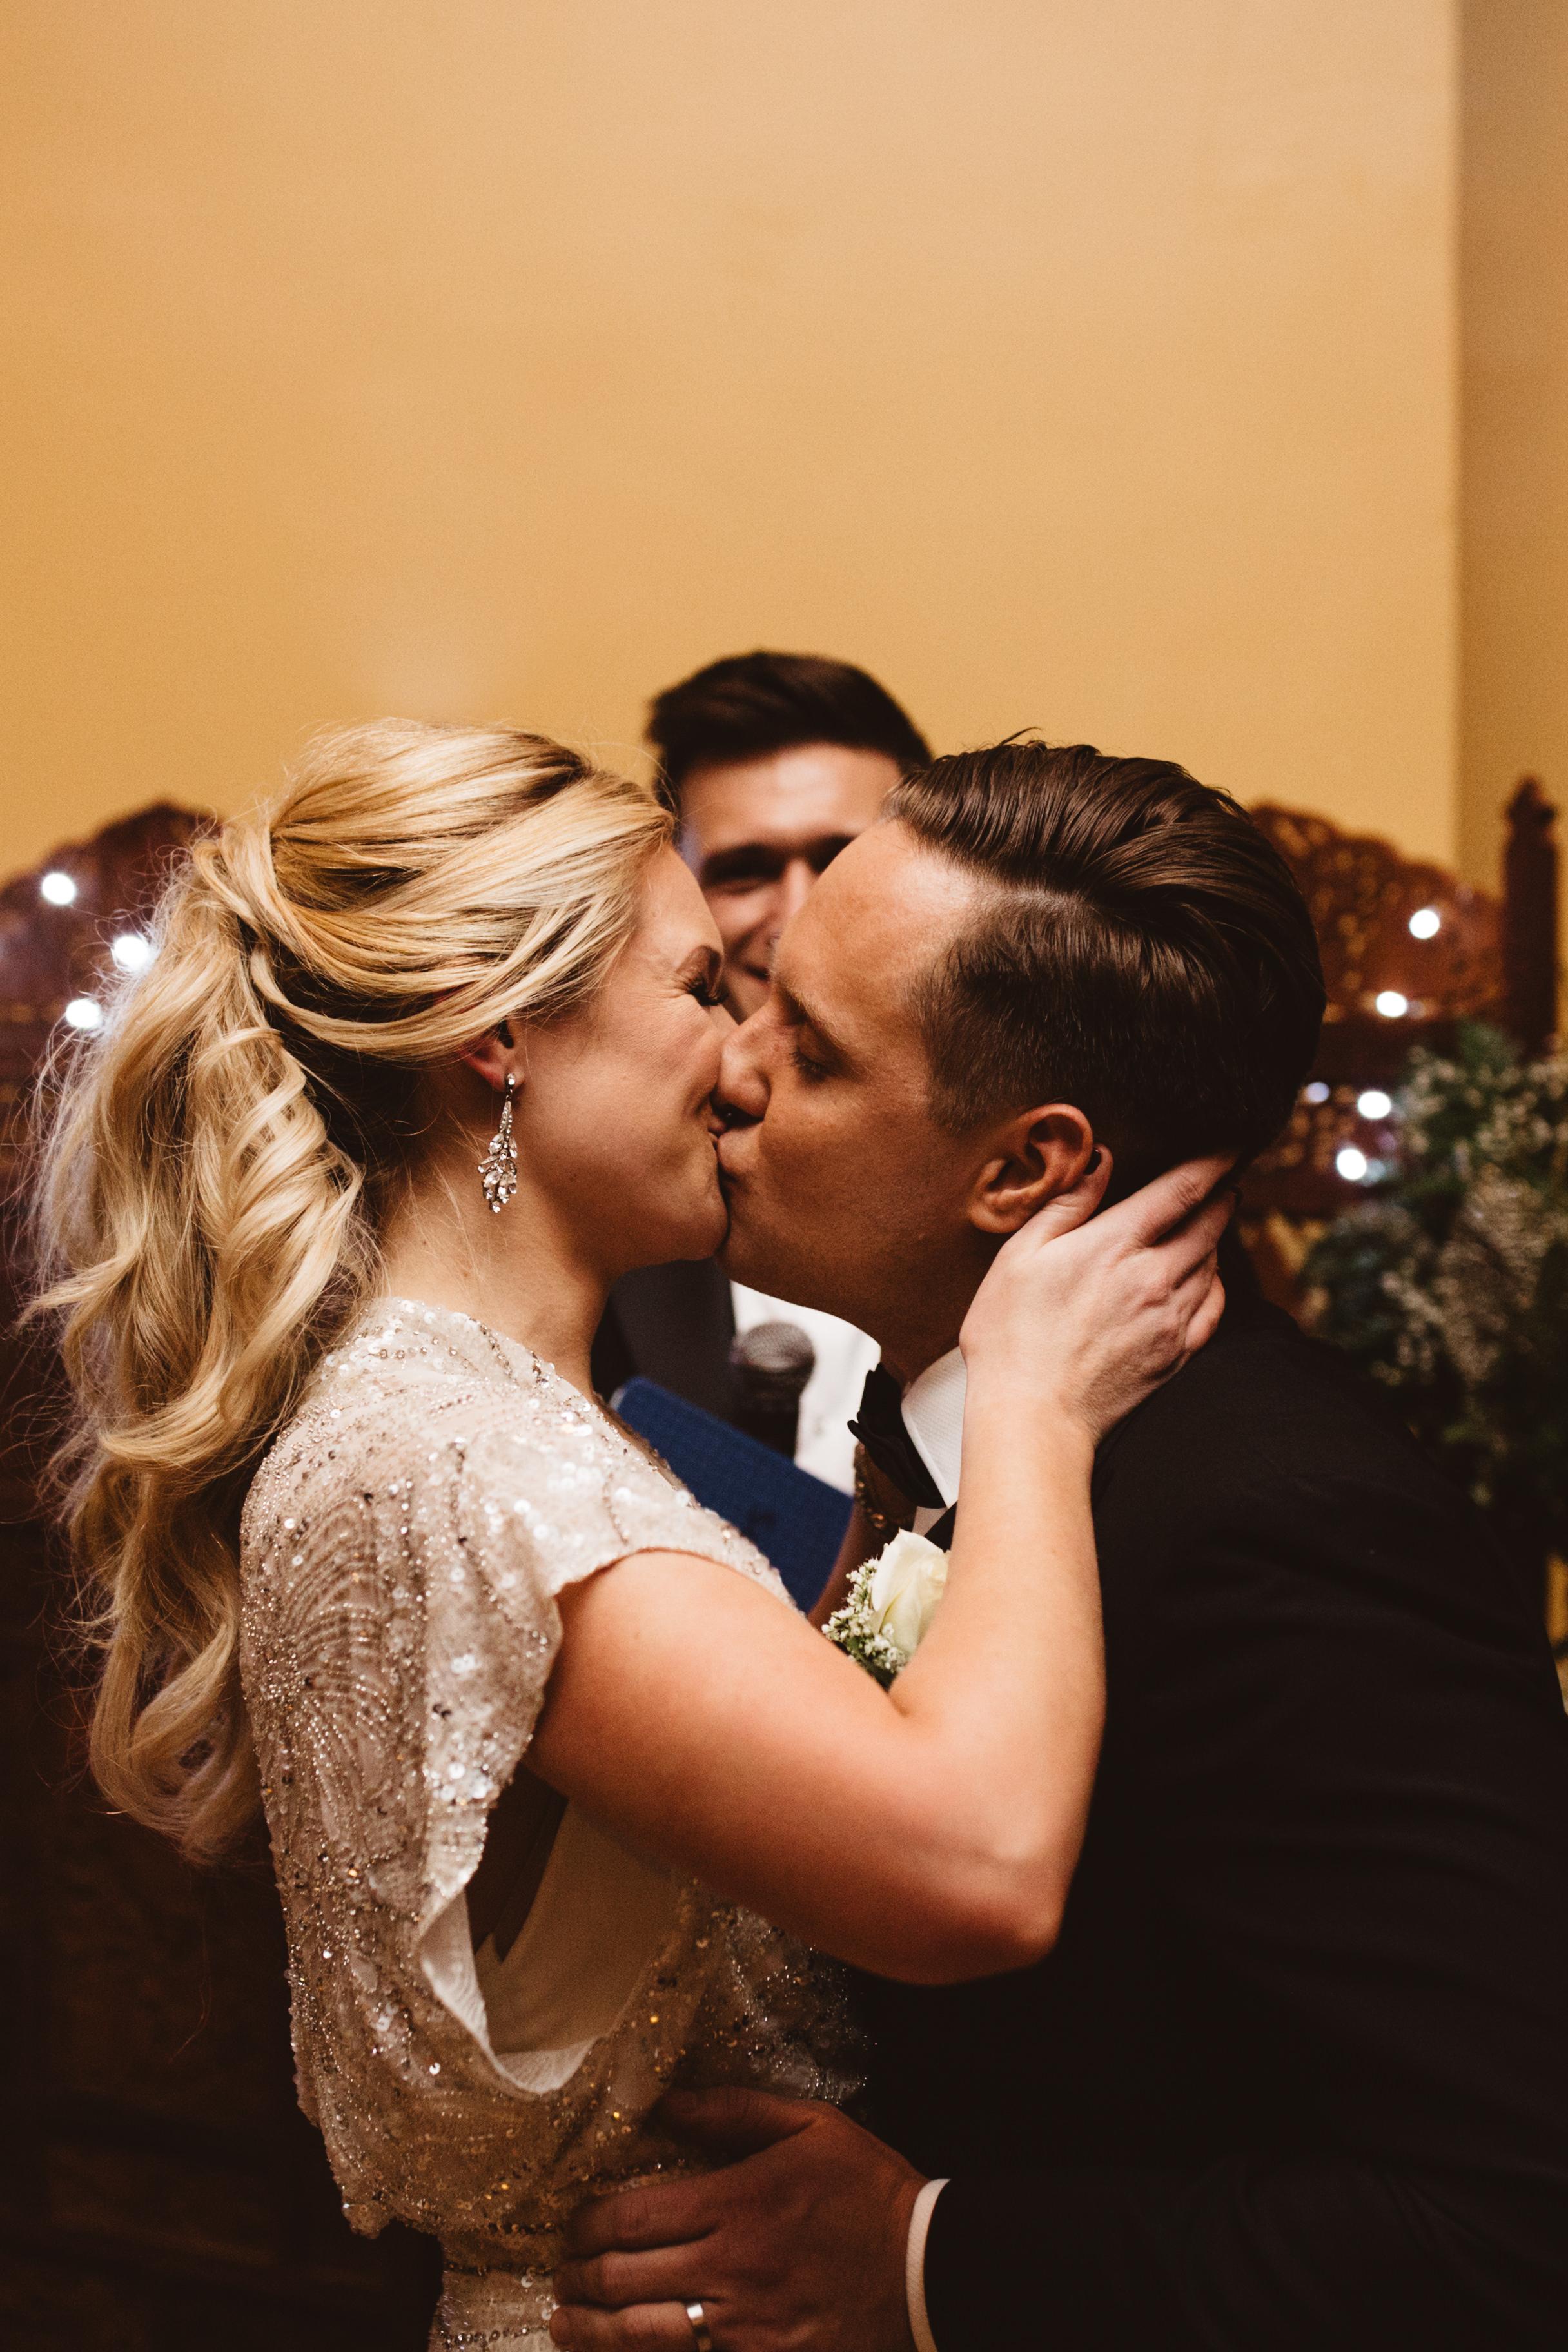 Mattie Bell Photography- Kelly & Zack Wedding Atlanta Brewery -340.jpg